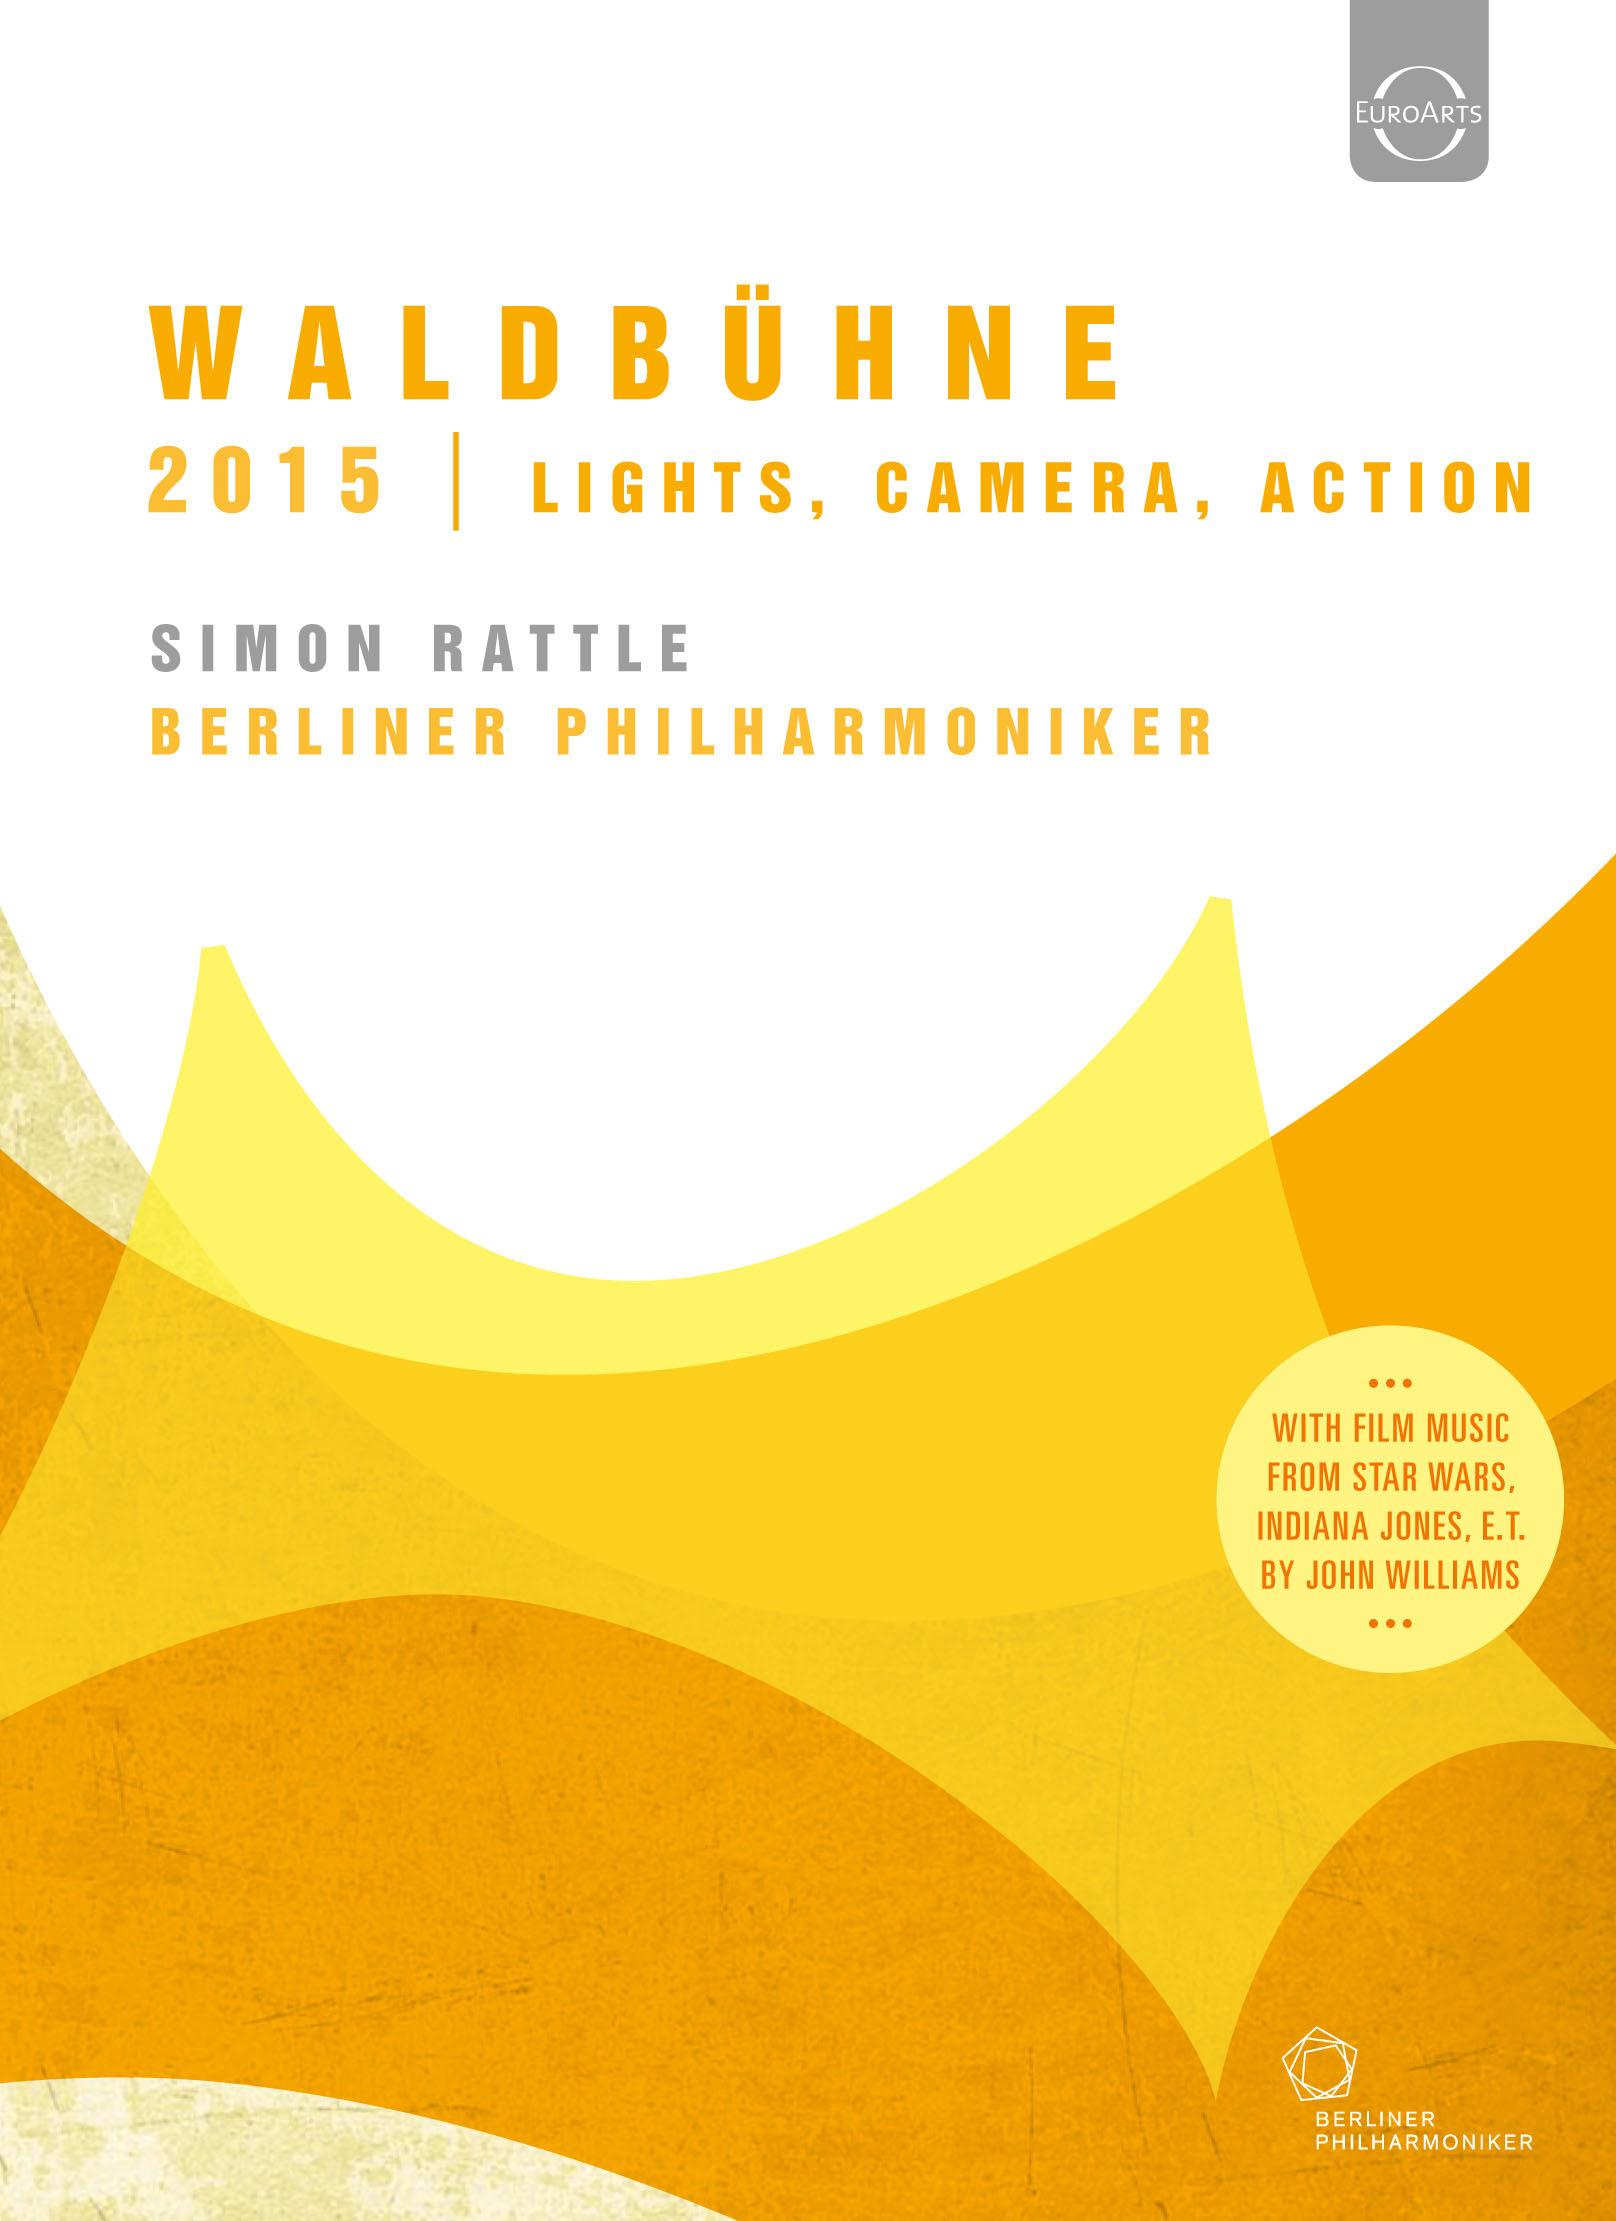 Simon Rattle/Berliner Philharmoniker: Waldbühne 2015 - Lights, Camera, Action!